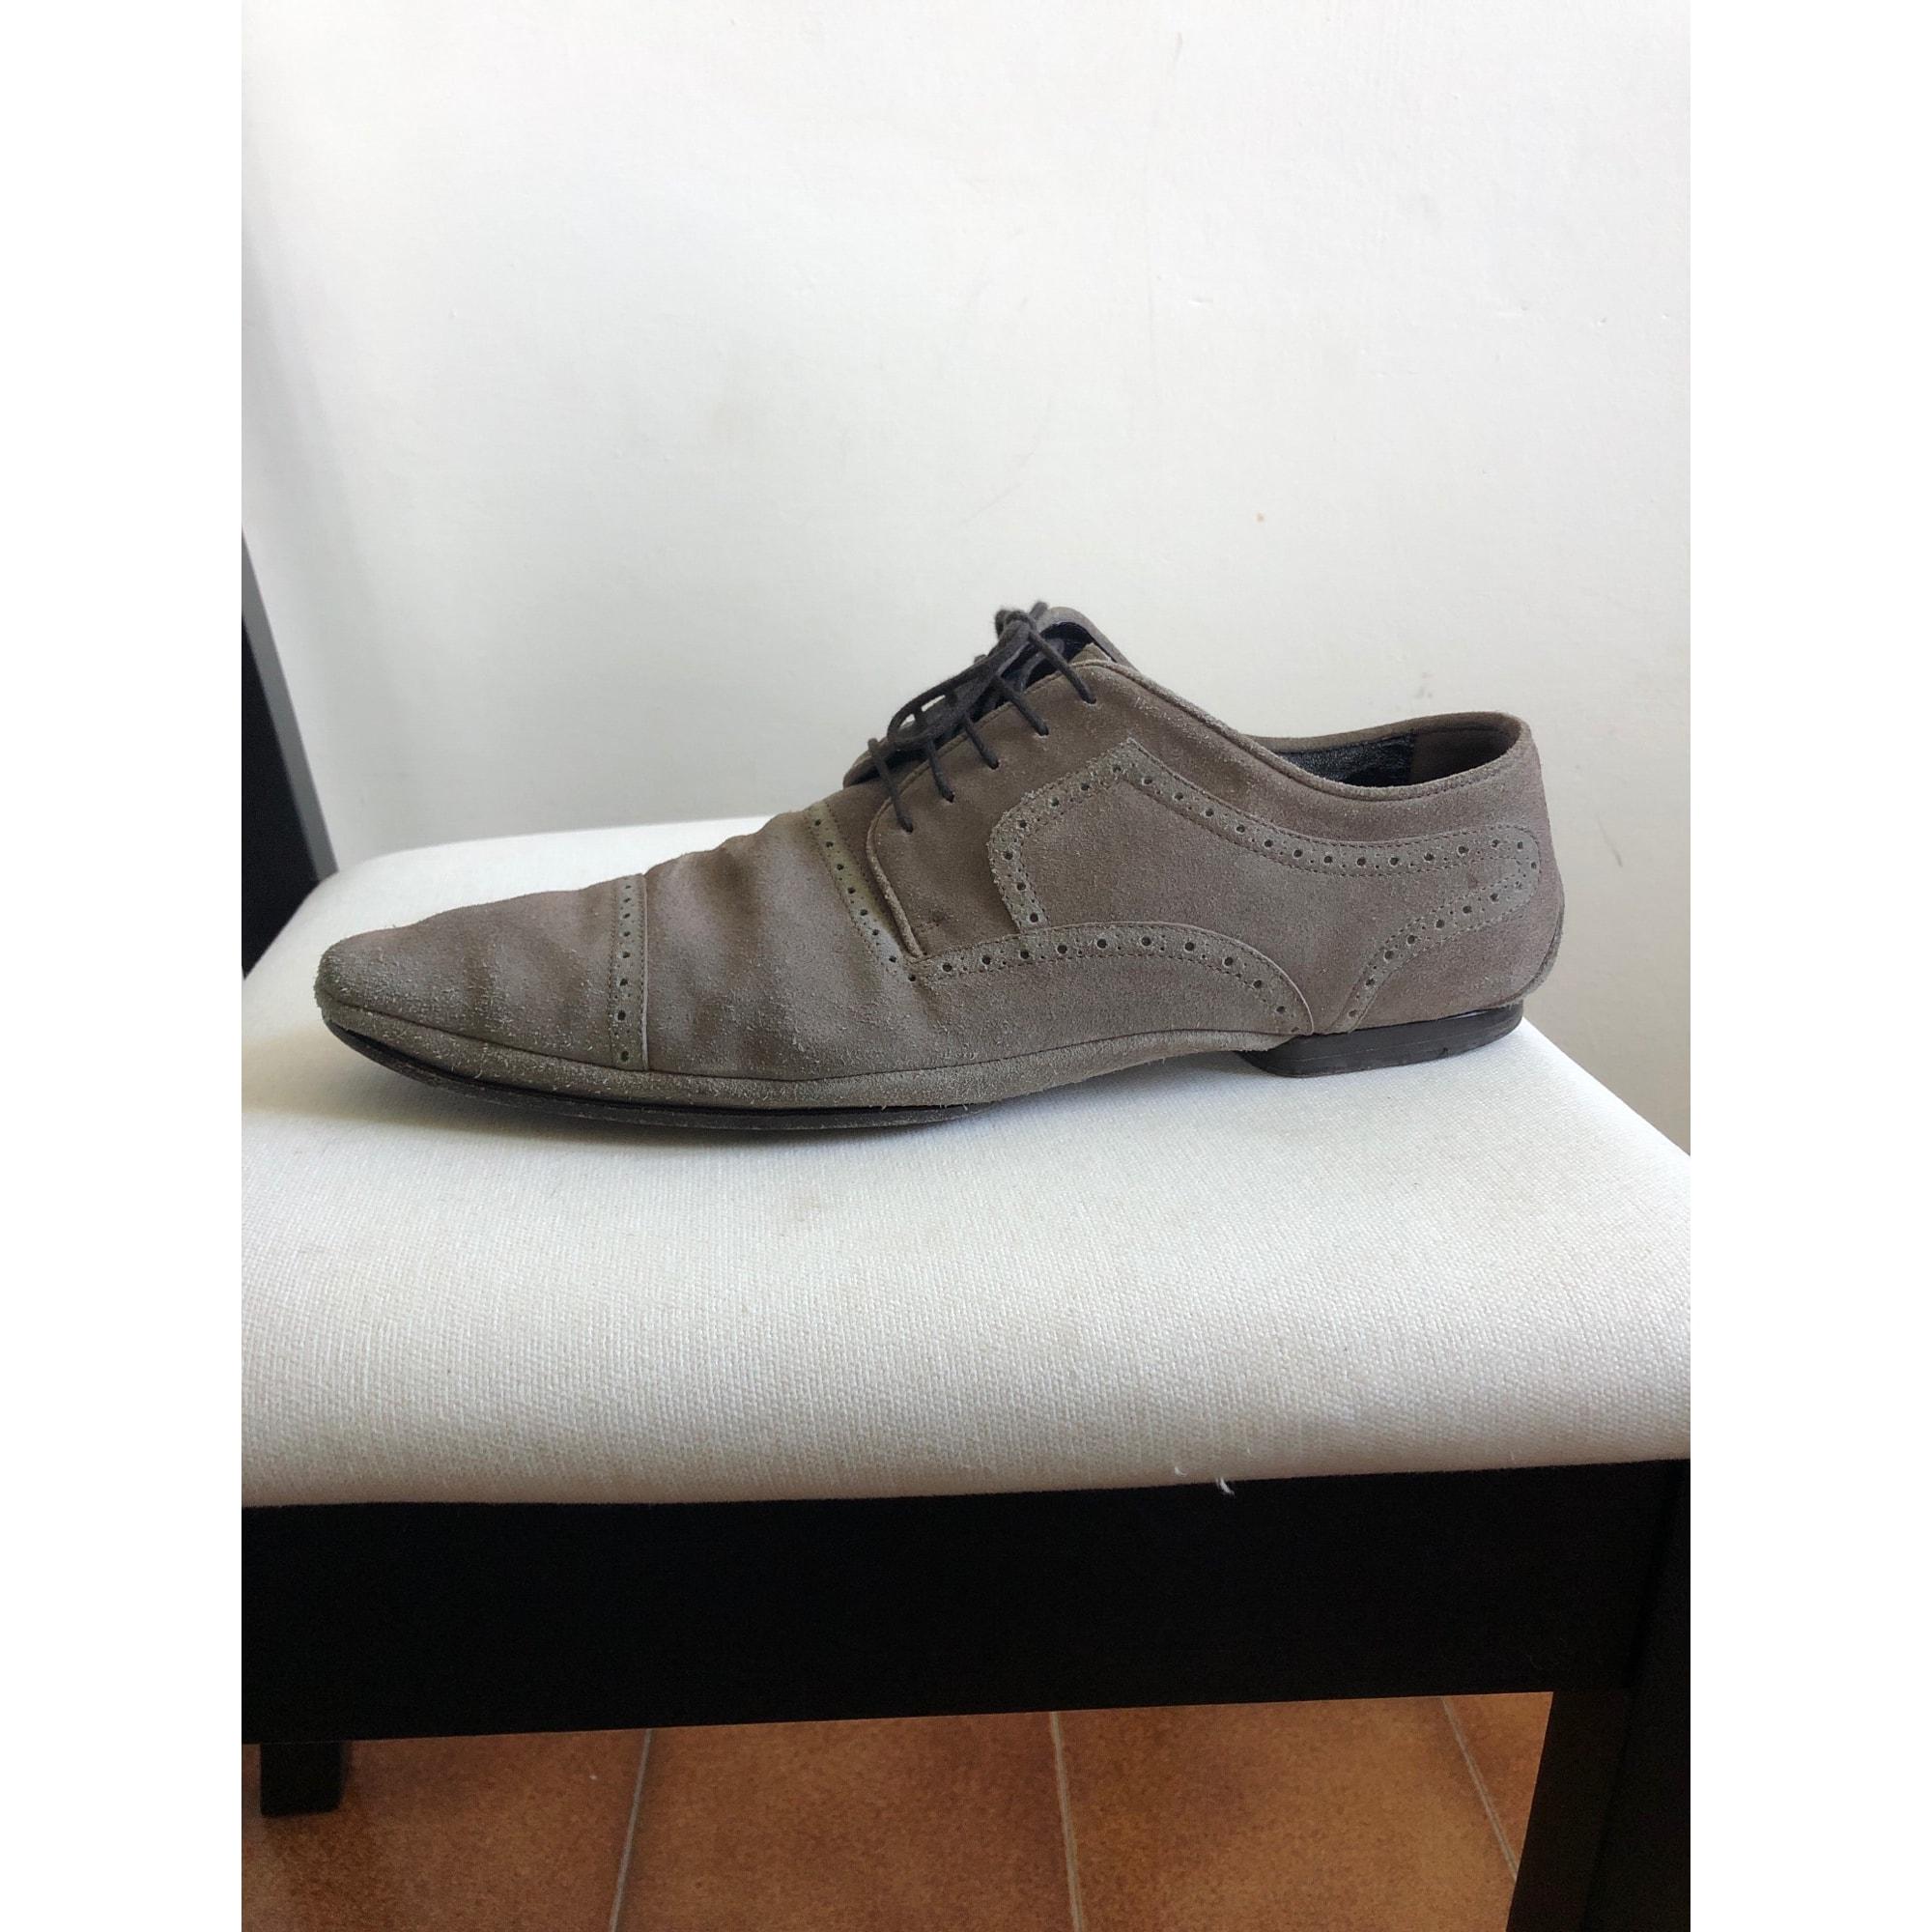 Lace Up Shoes DOLCE & GABBANA Beige, camel